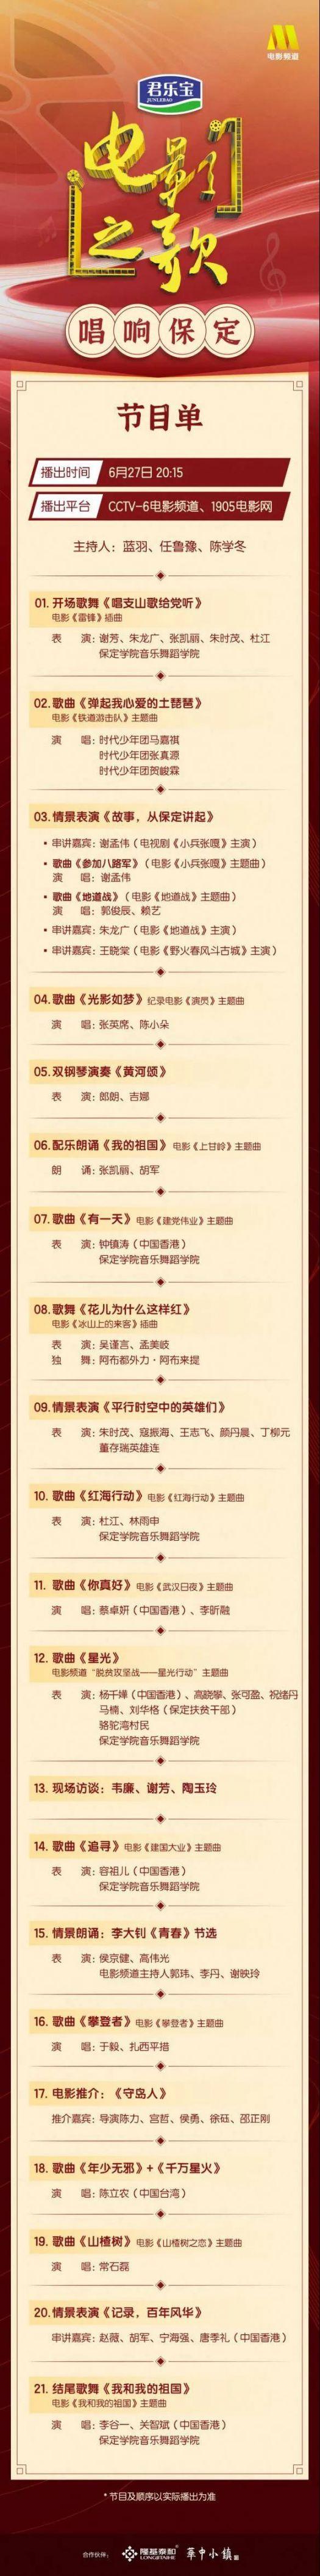 CCTV电影之歌保定站演出节目单